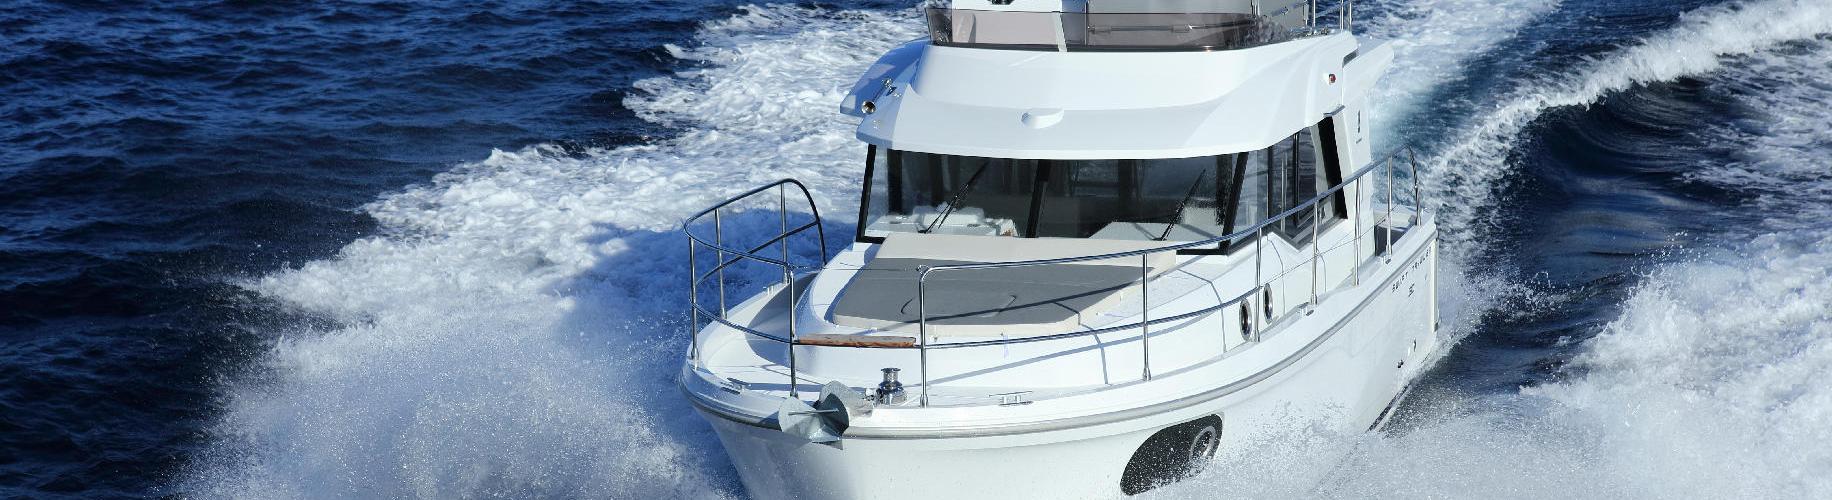 barca a motore Swift Trawler 30